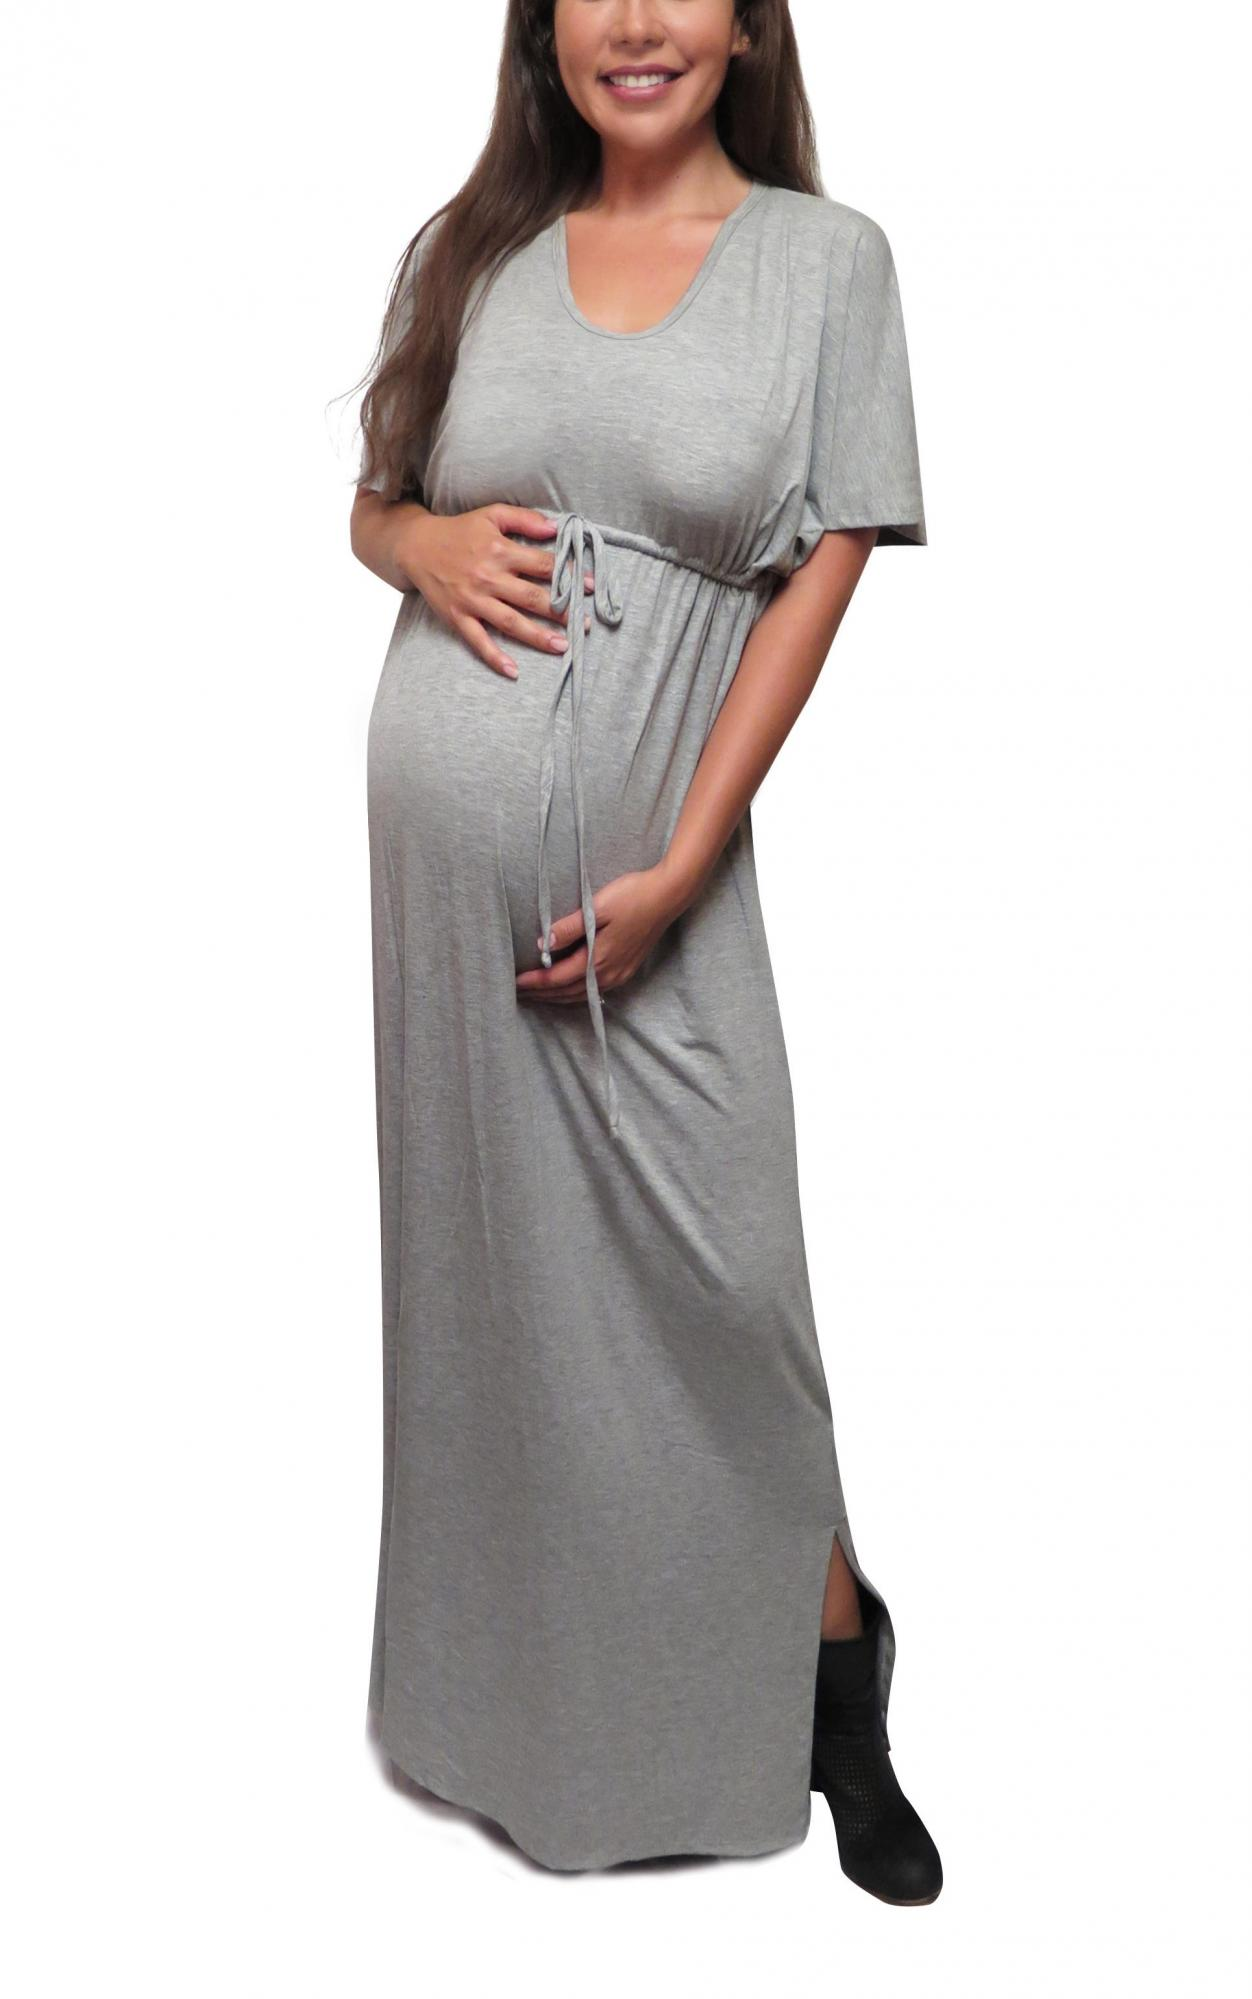 bun-to-baby-kaftan-maxi-nursing-dress-maternity.jpg